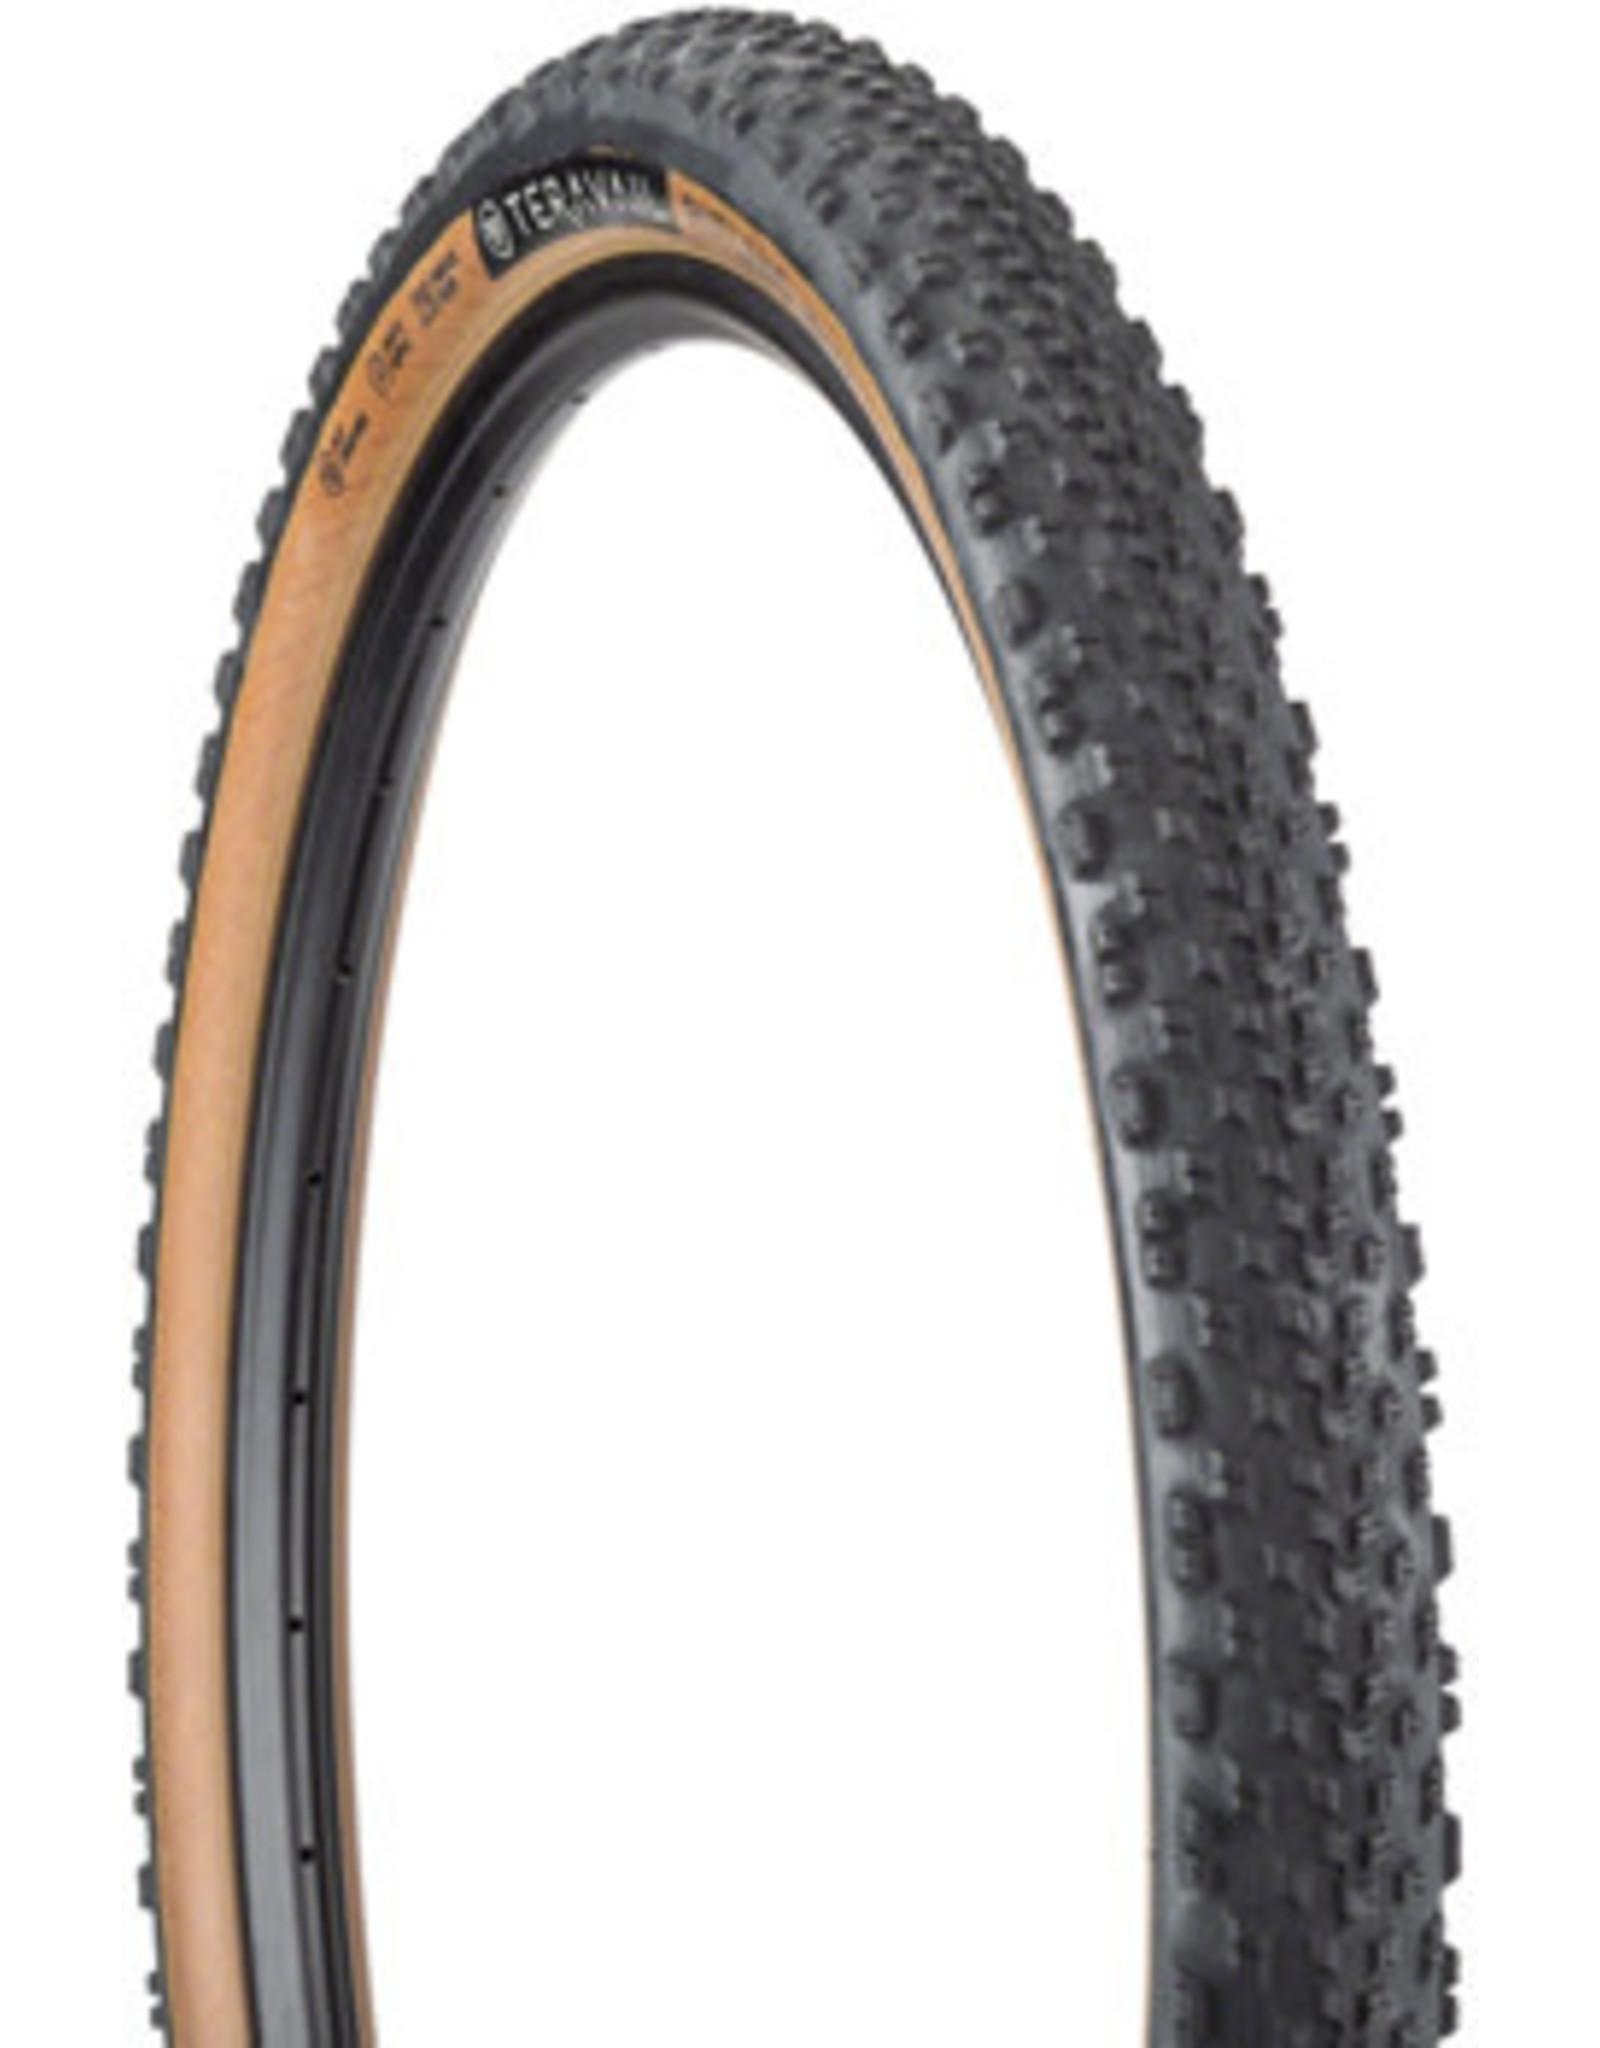 Teravail Teravail Rutland Tire - 29 x 2.2, Tubeless, Folding, Tan, Durable